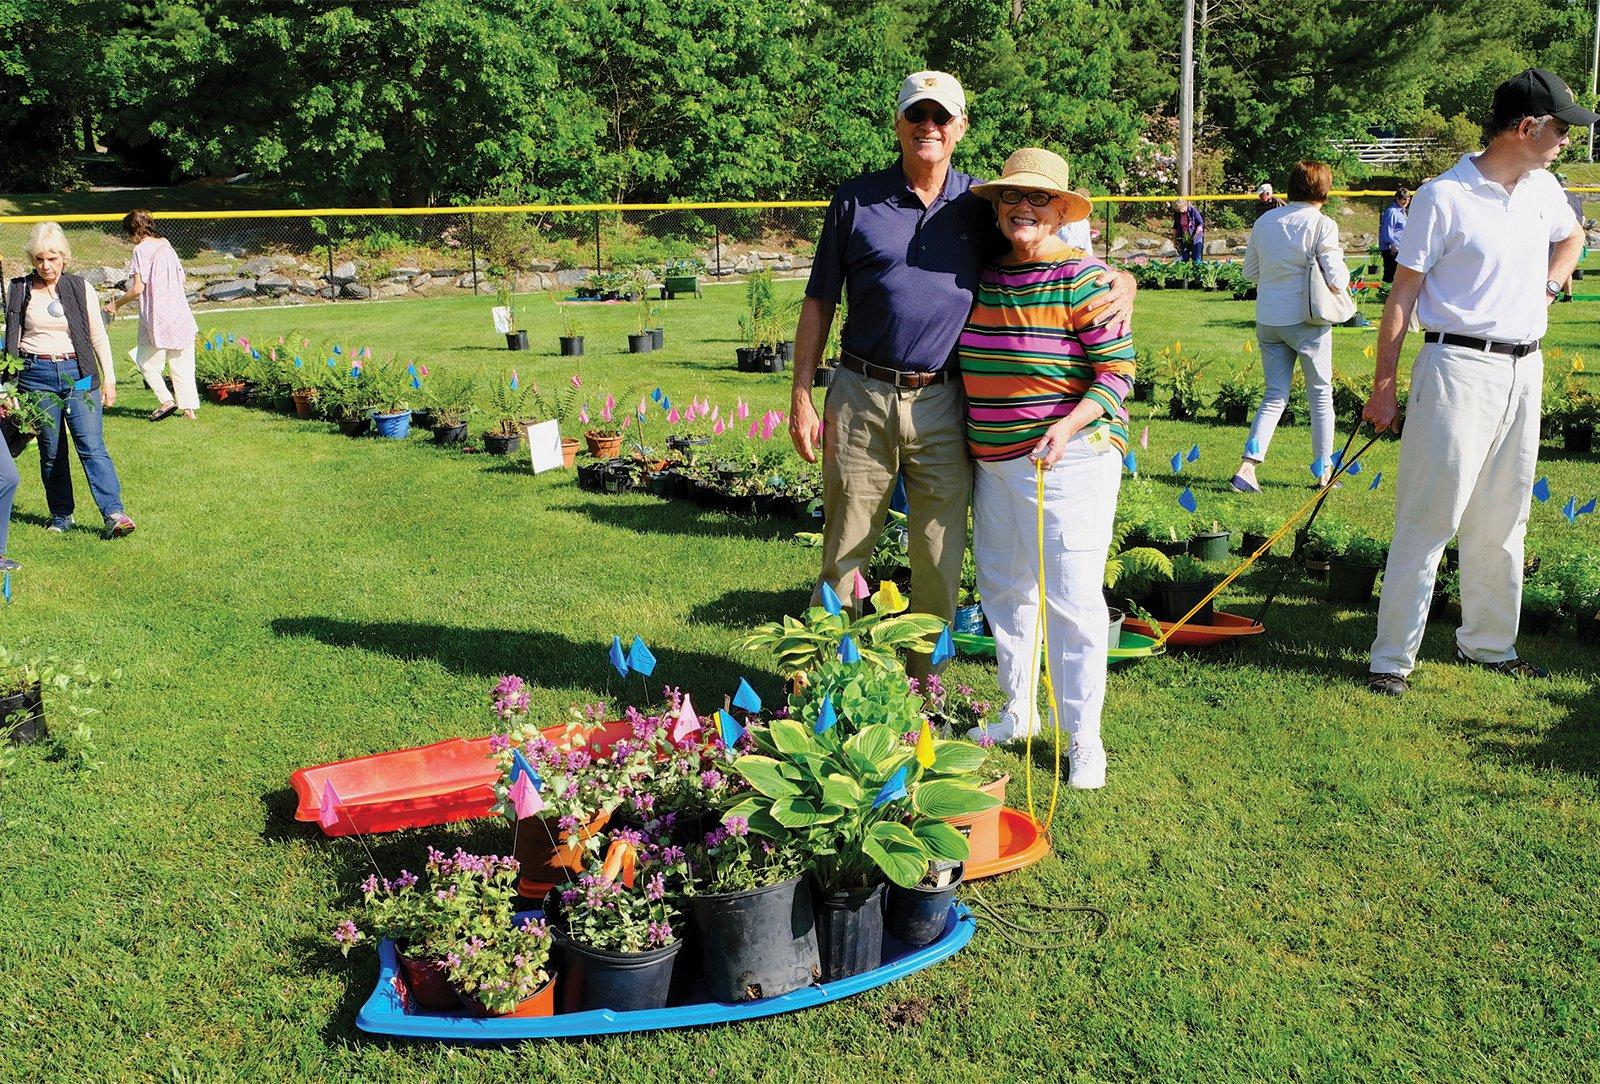 mountain-garden-club-plant-sale-the-highlands-nc-couple